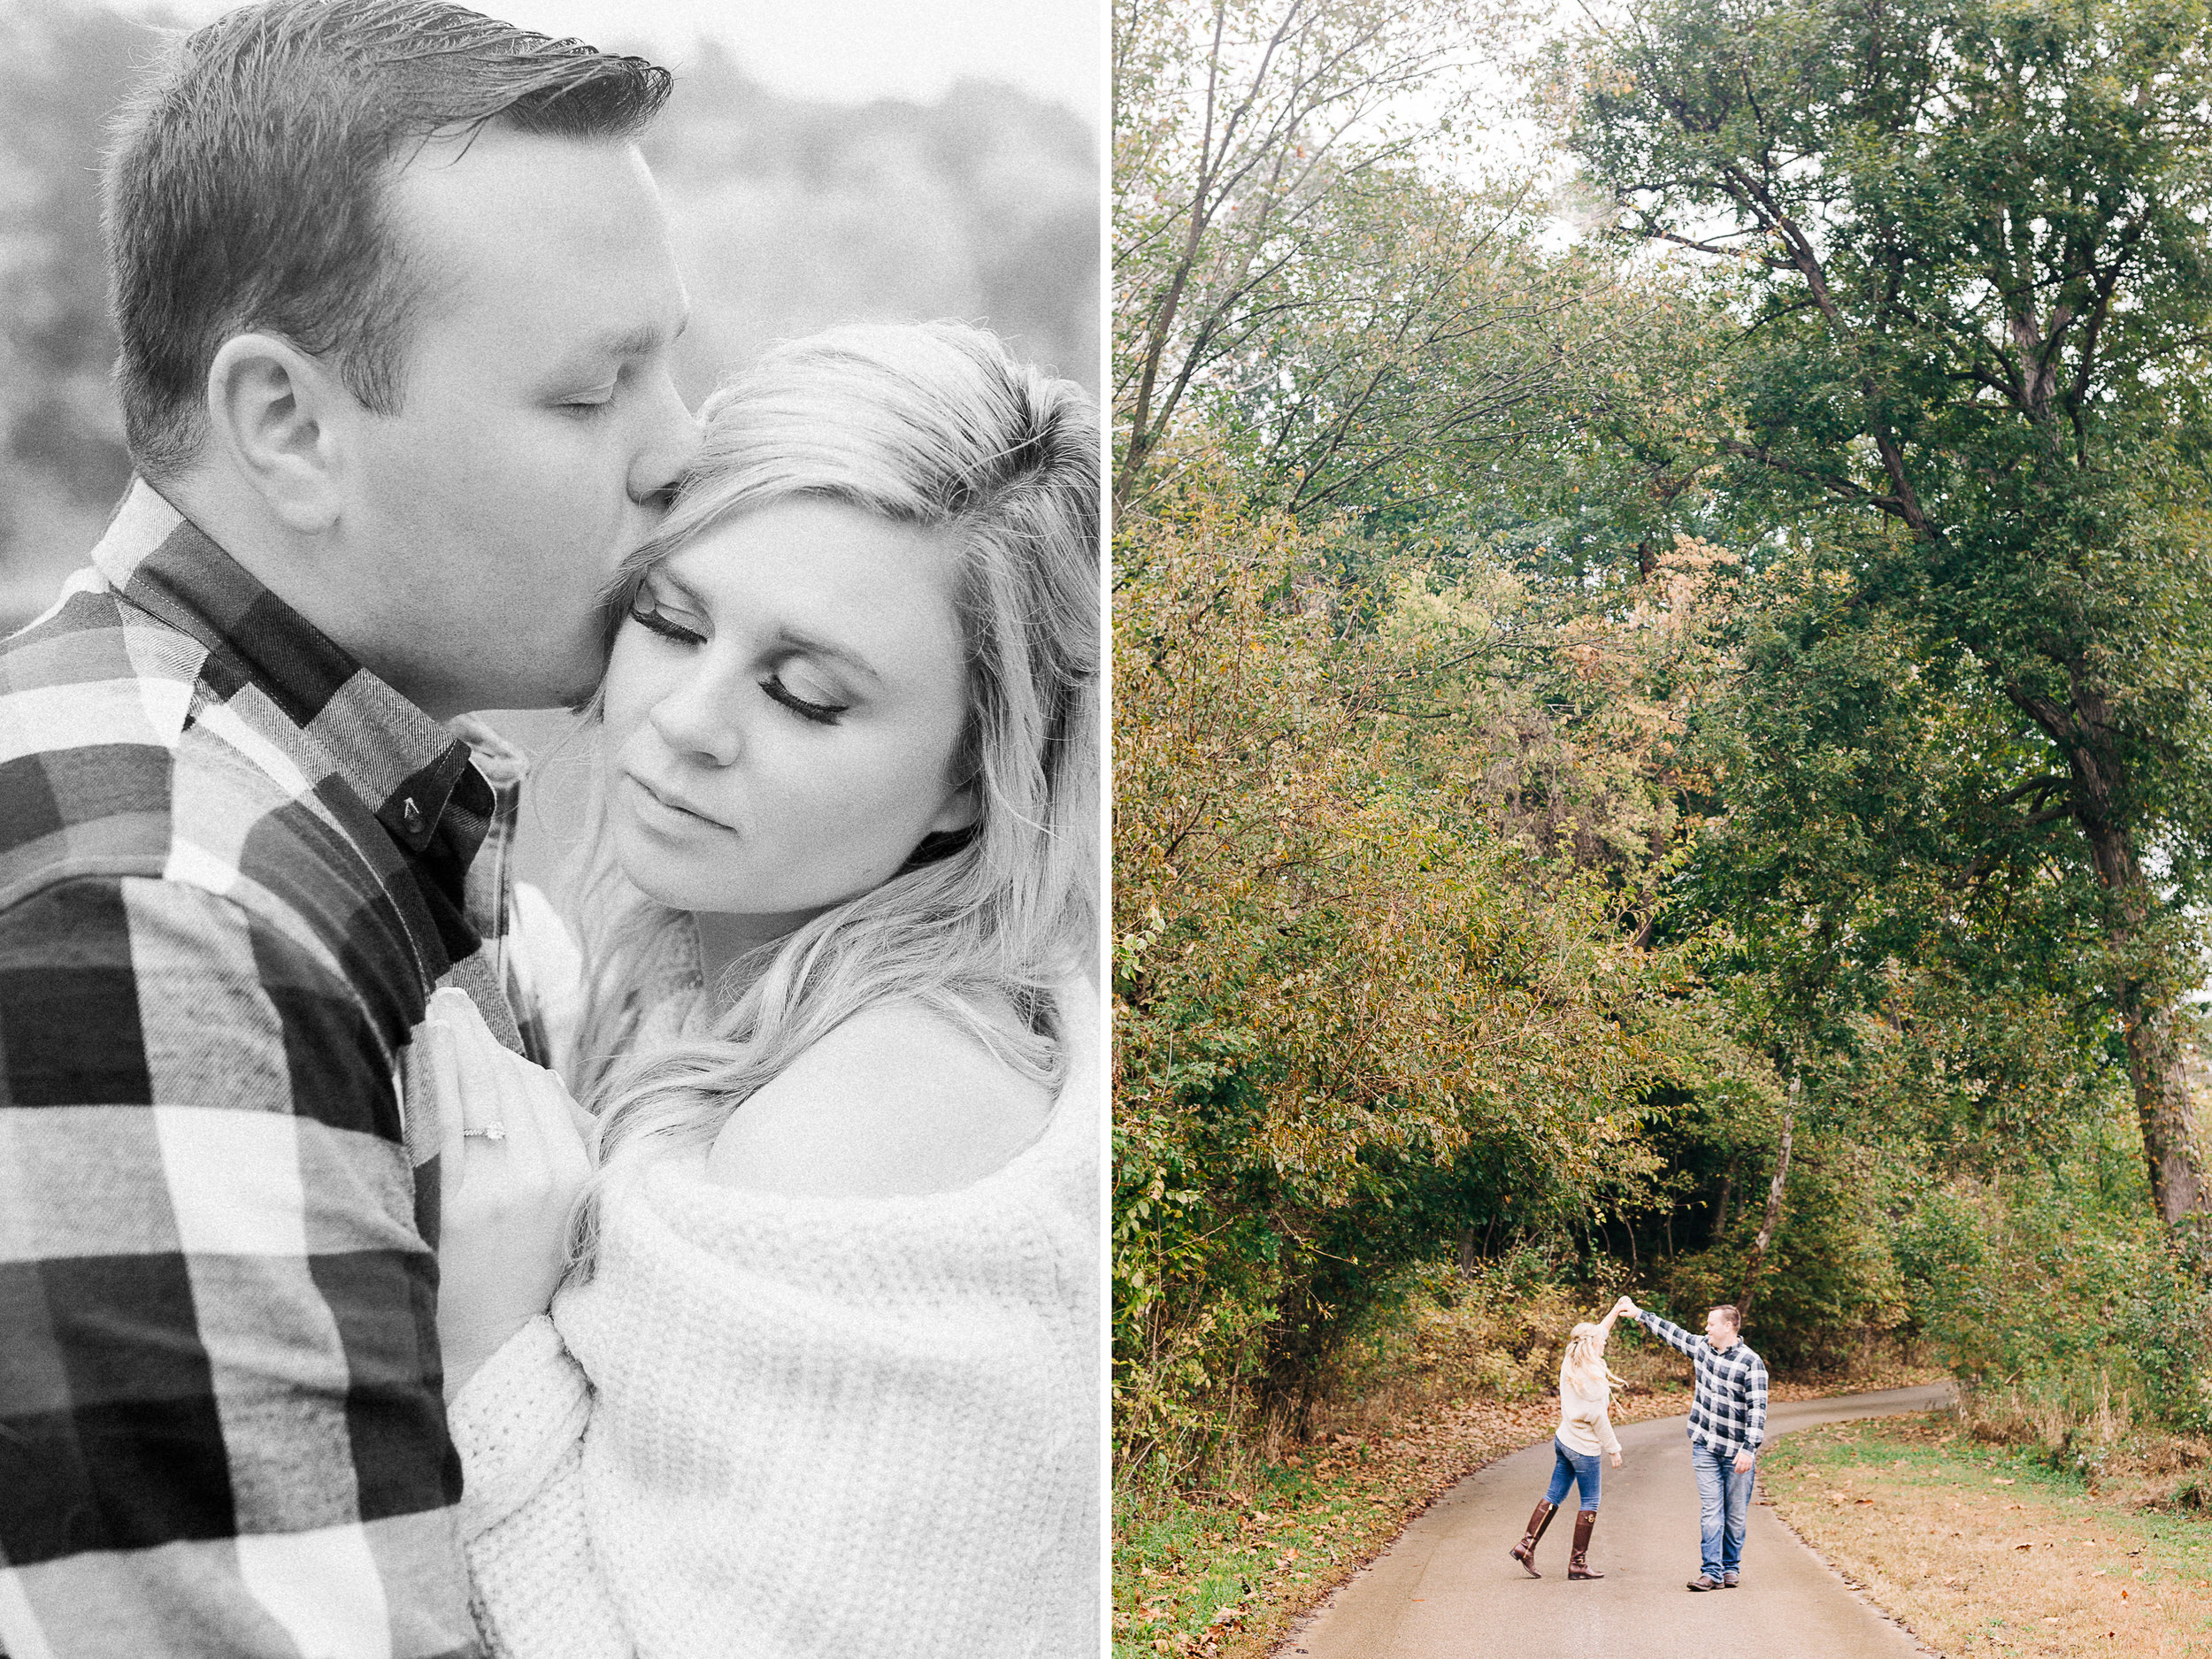 Dorothy_Louise_Photography_Alyssa_Drew_Engagement2.jpg